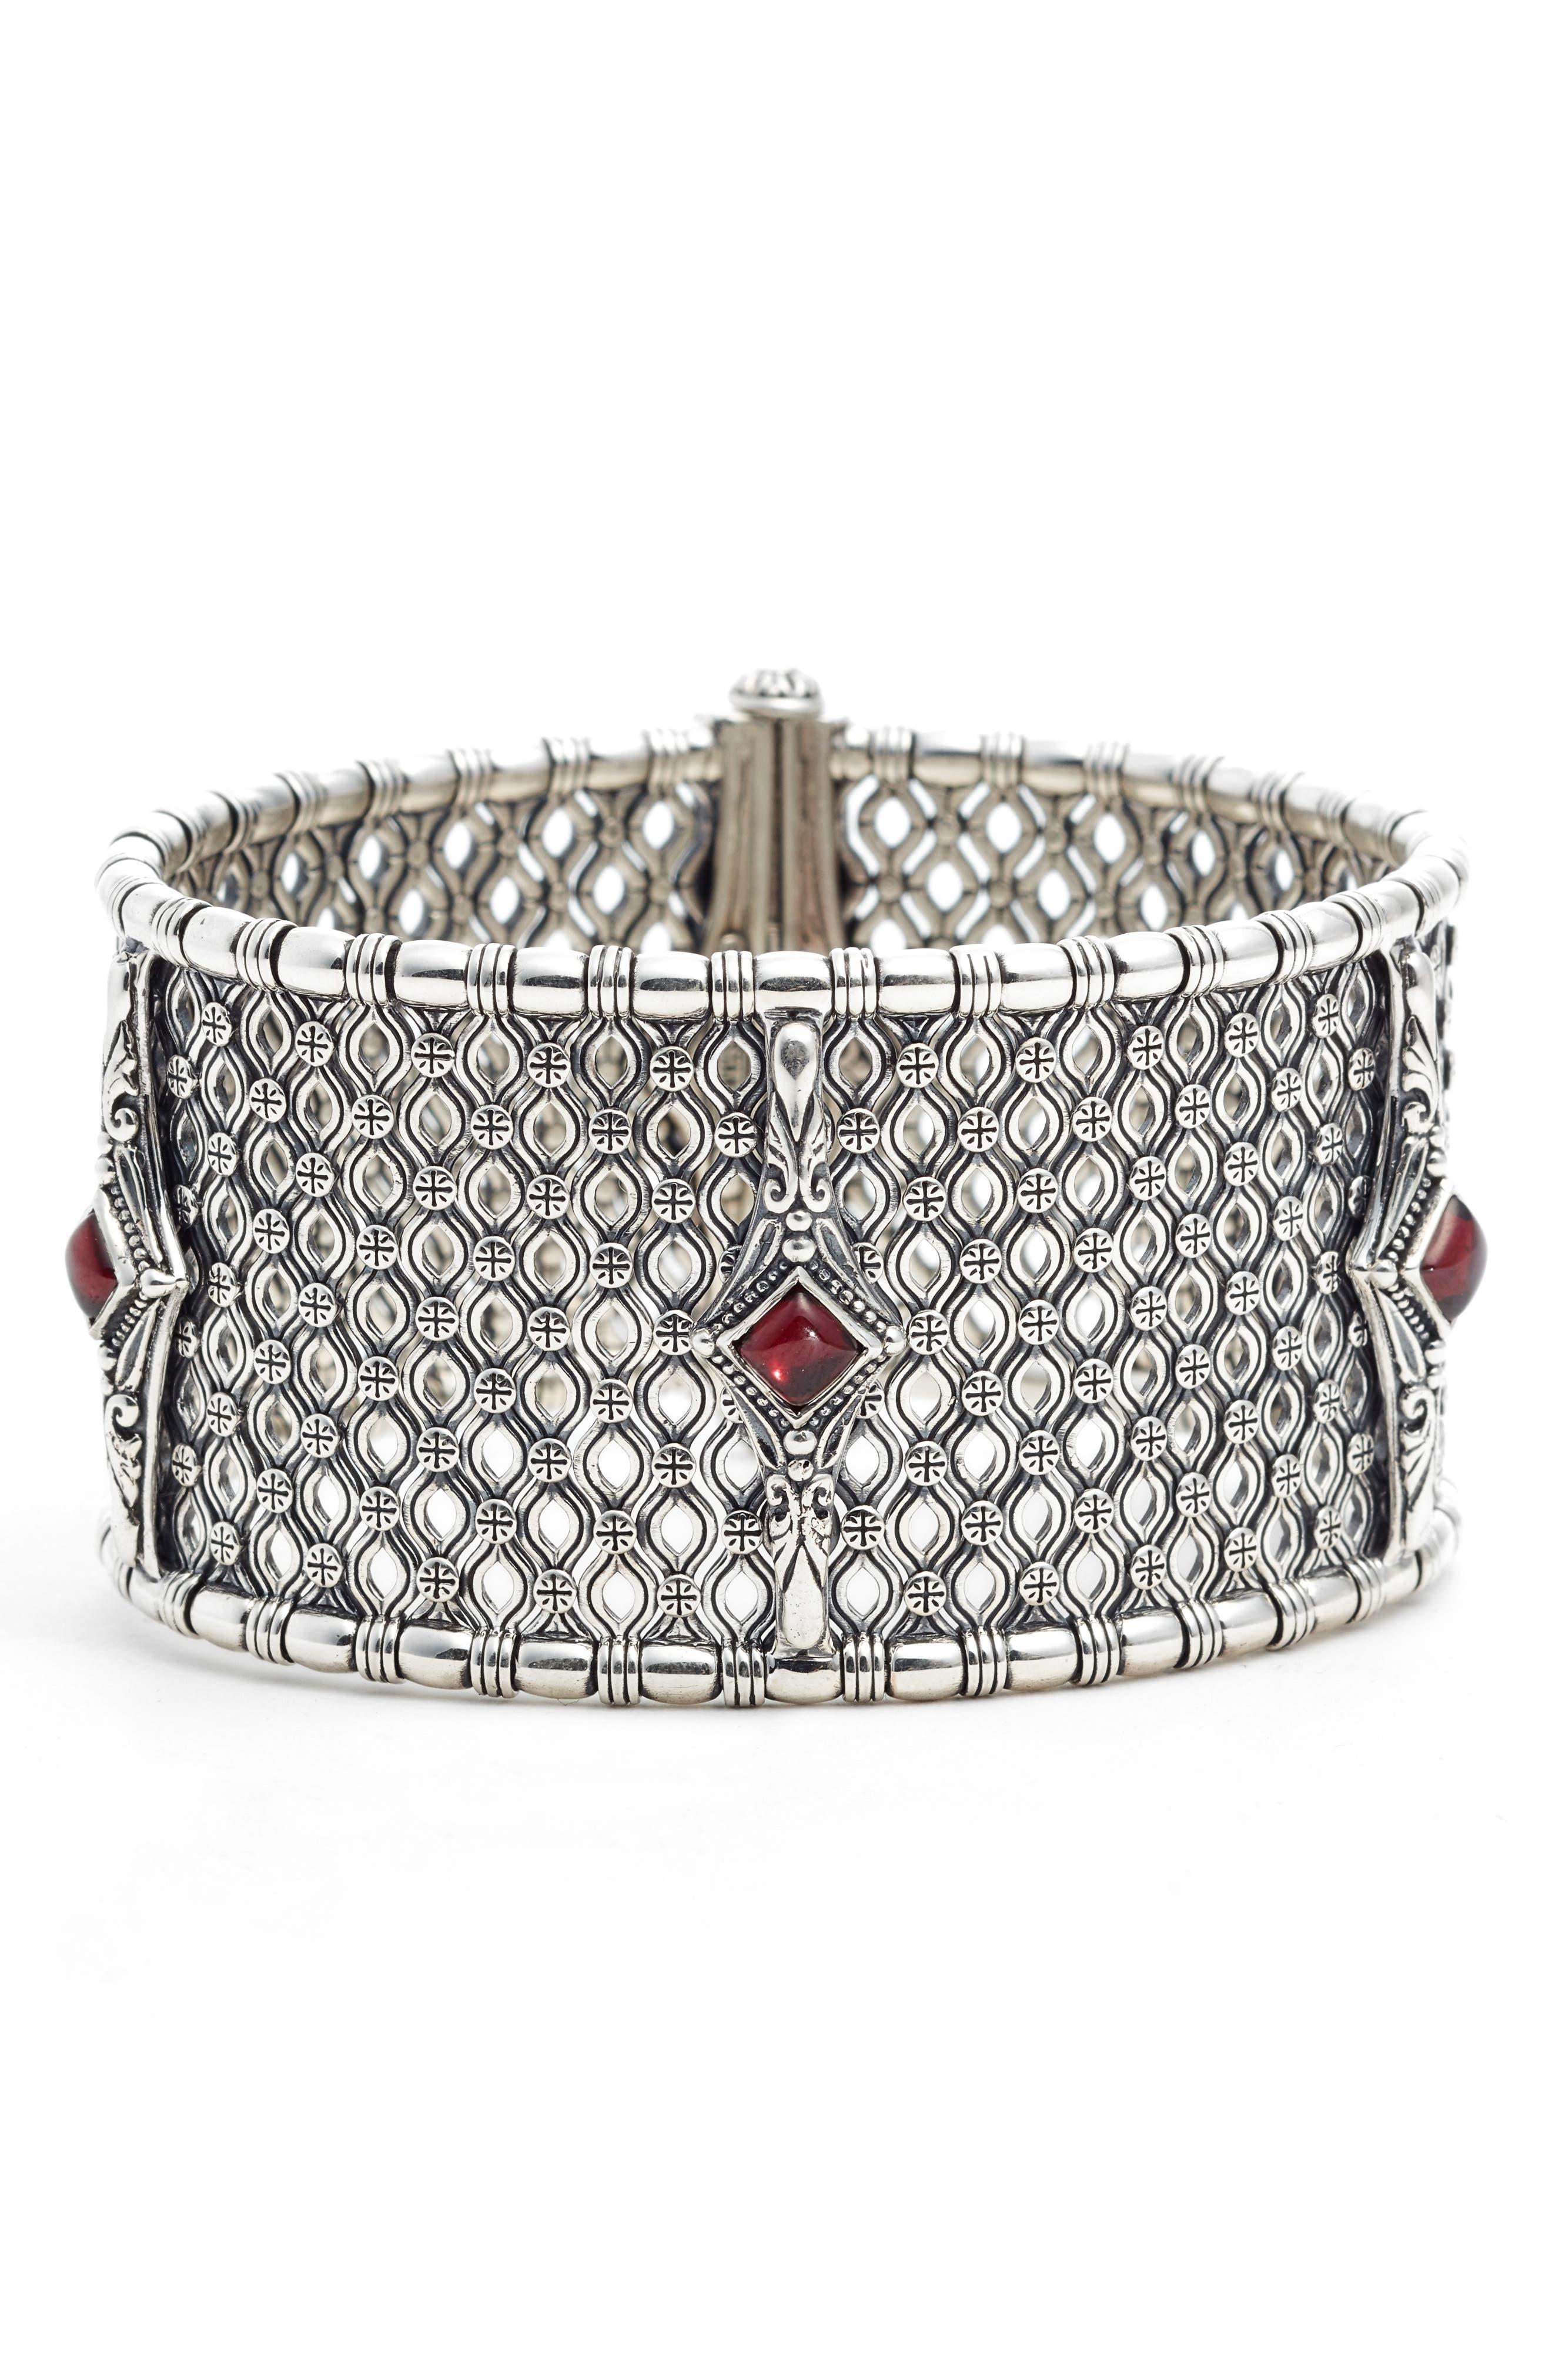 Etched Silver & Rhodolite Garnet Cuff Bracelet,                         Main,                         color, Silver/ Gold/ White